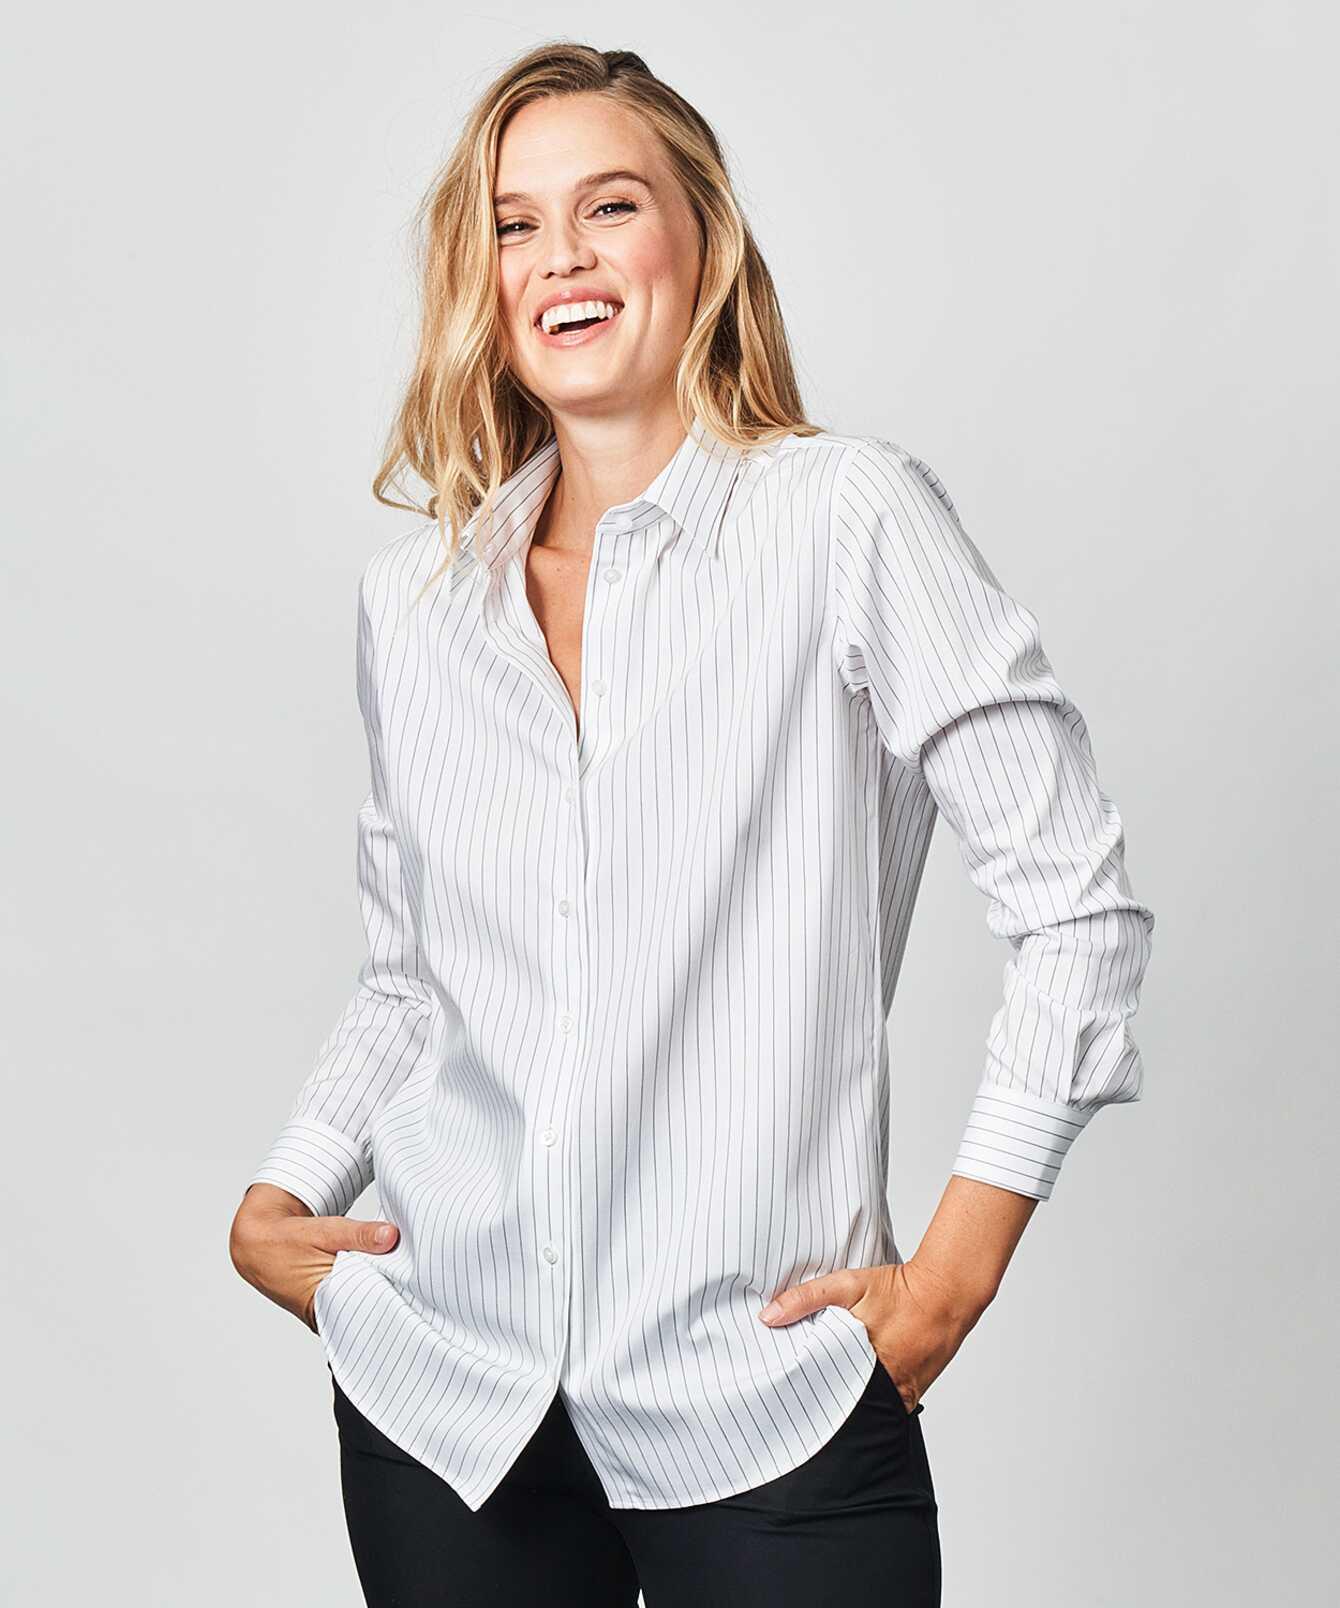 Skjorta Mickan Classic The Shirt Factory